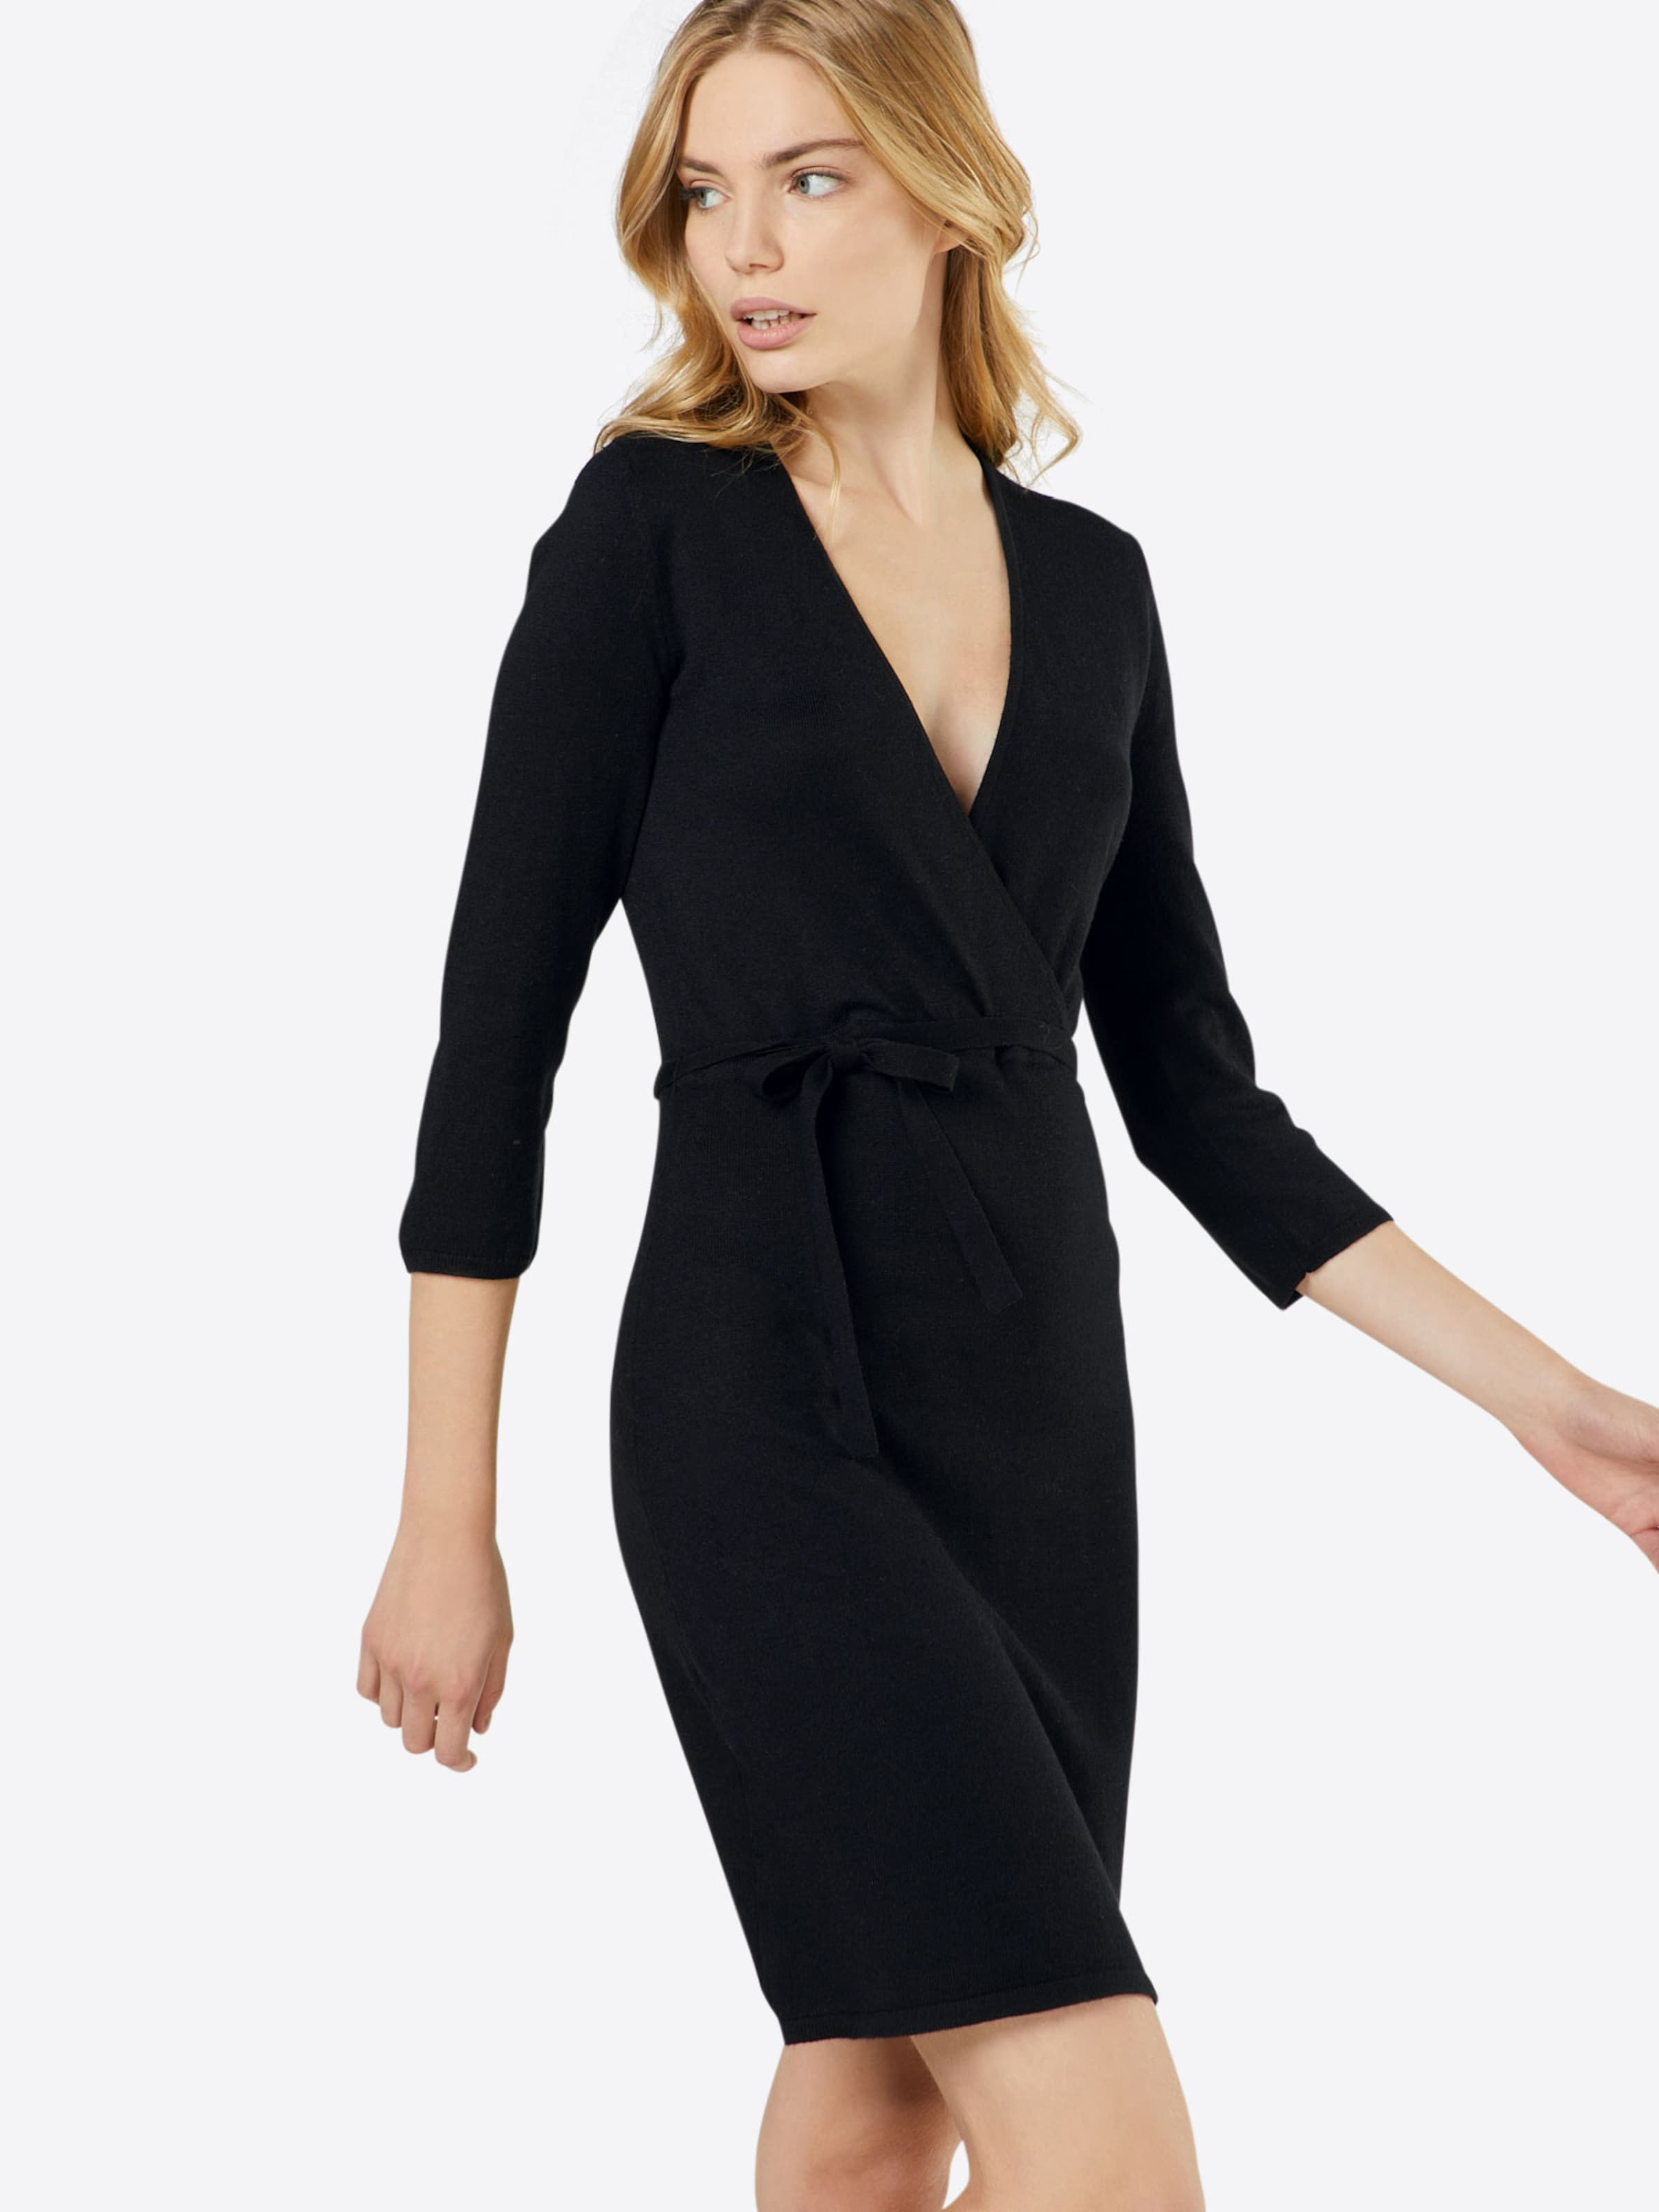 BY Dress EDC EDC ESPRIT ESPRIT 'wrap' 'wrap' EDC ESPRIT Dress EDC BY Dress 'wrap' BY BY qTwFSSW84